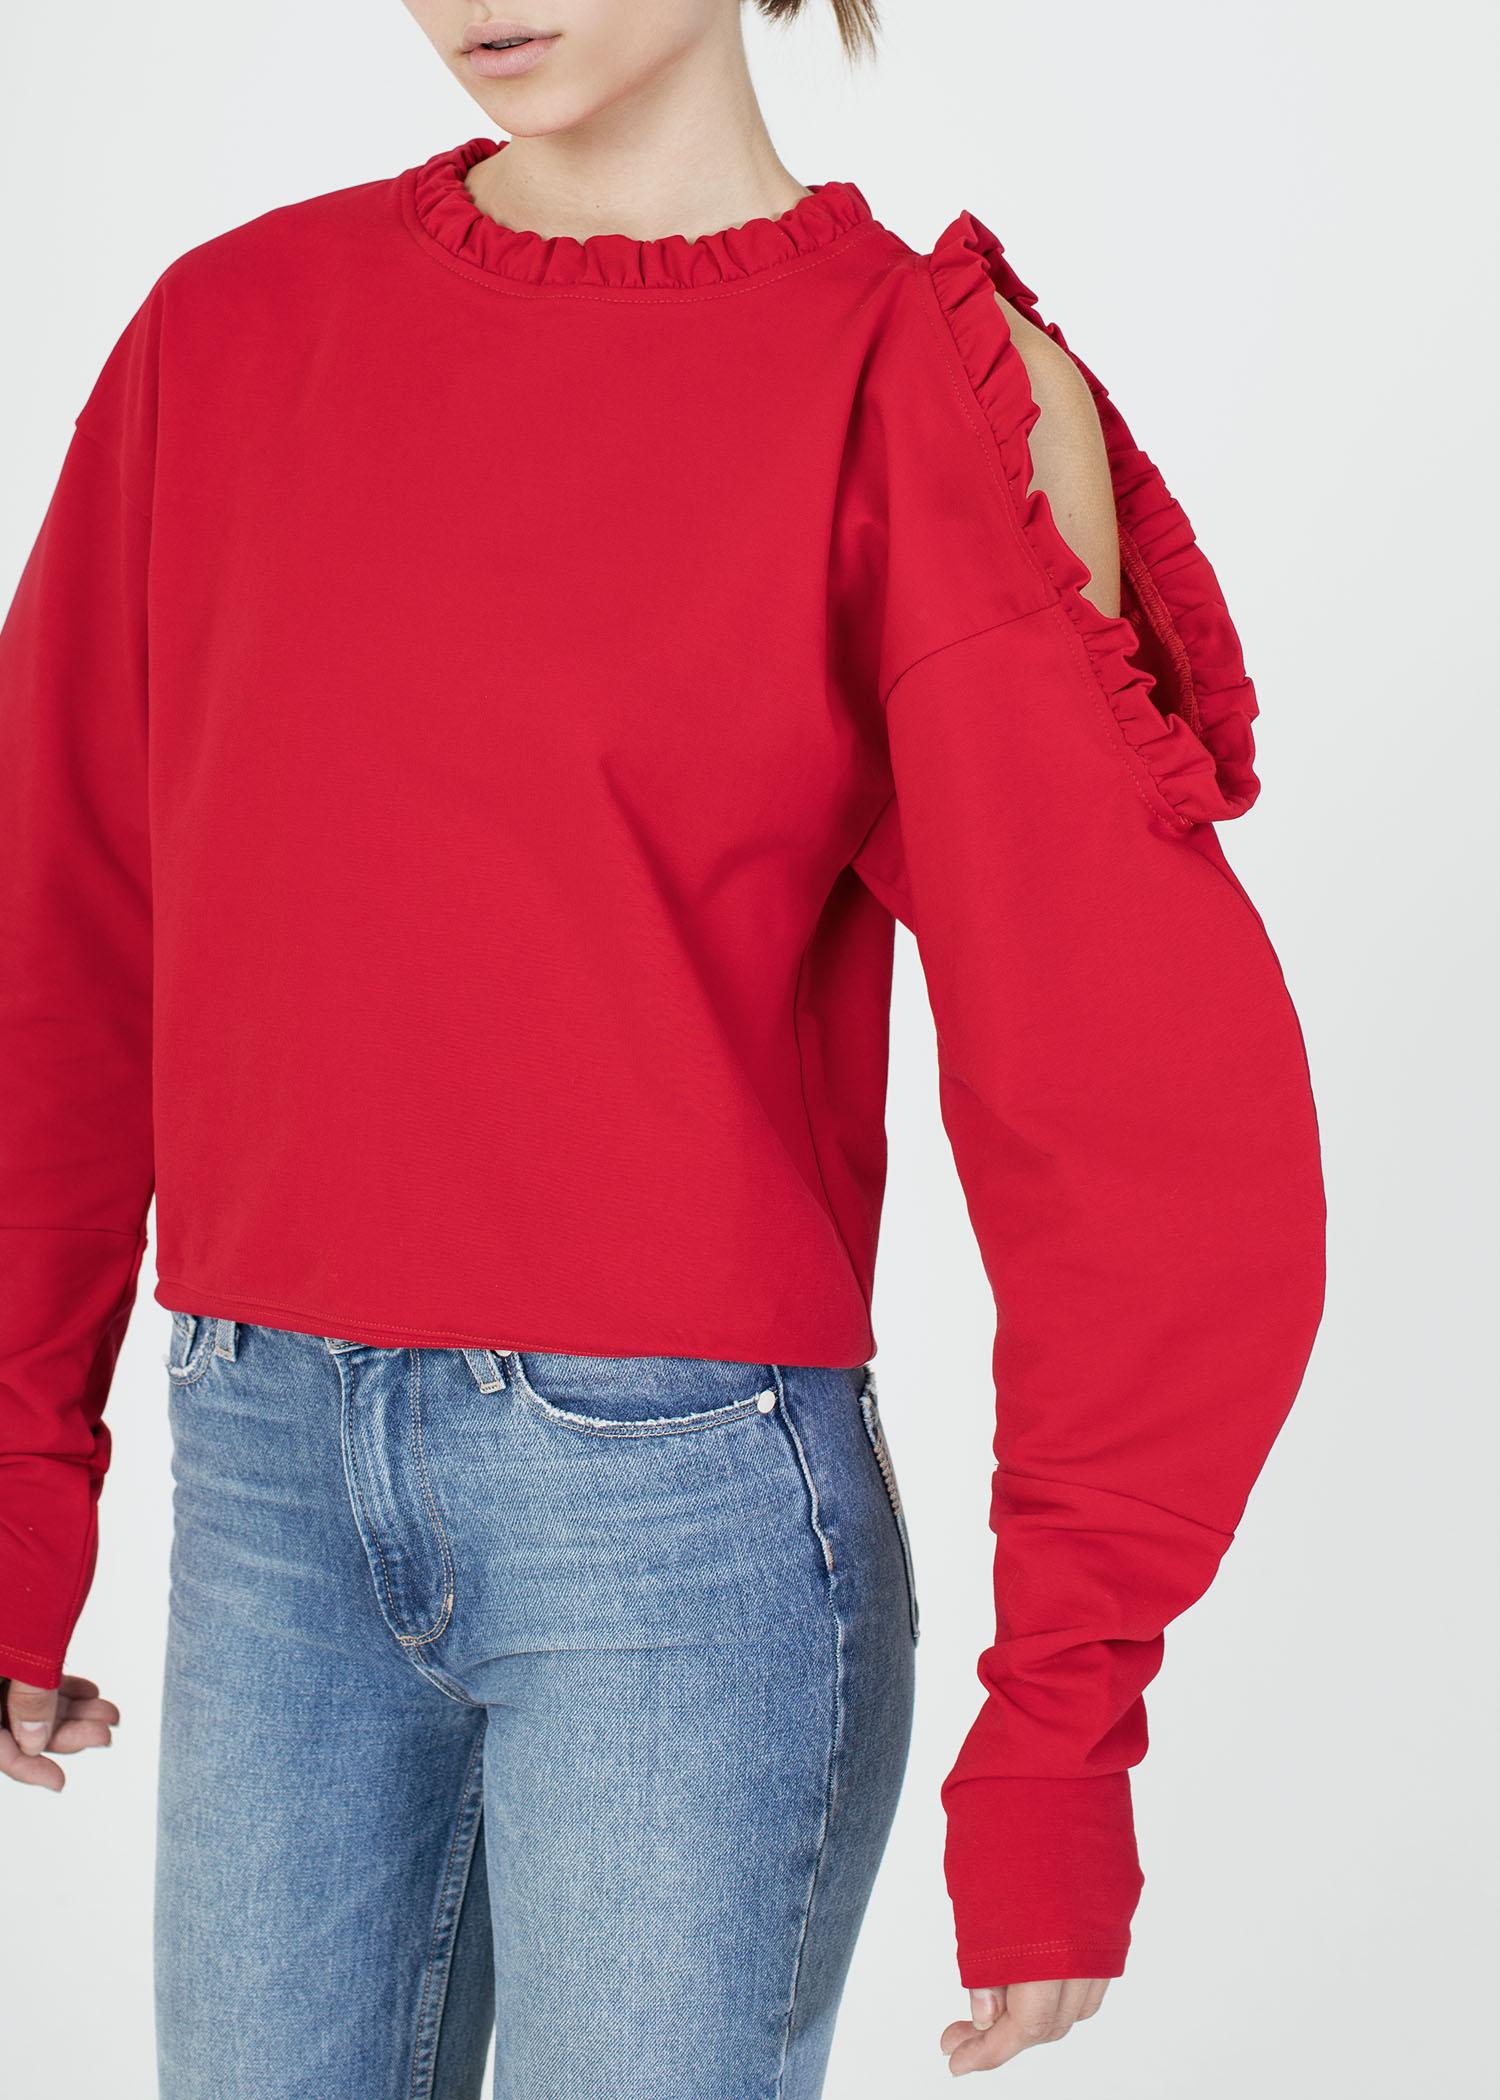 byTSANG season II ruffle peekaboo sweatshirt in scarlet